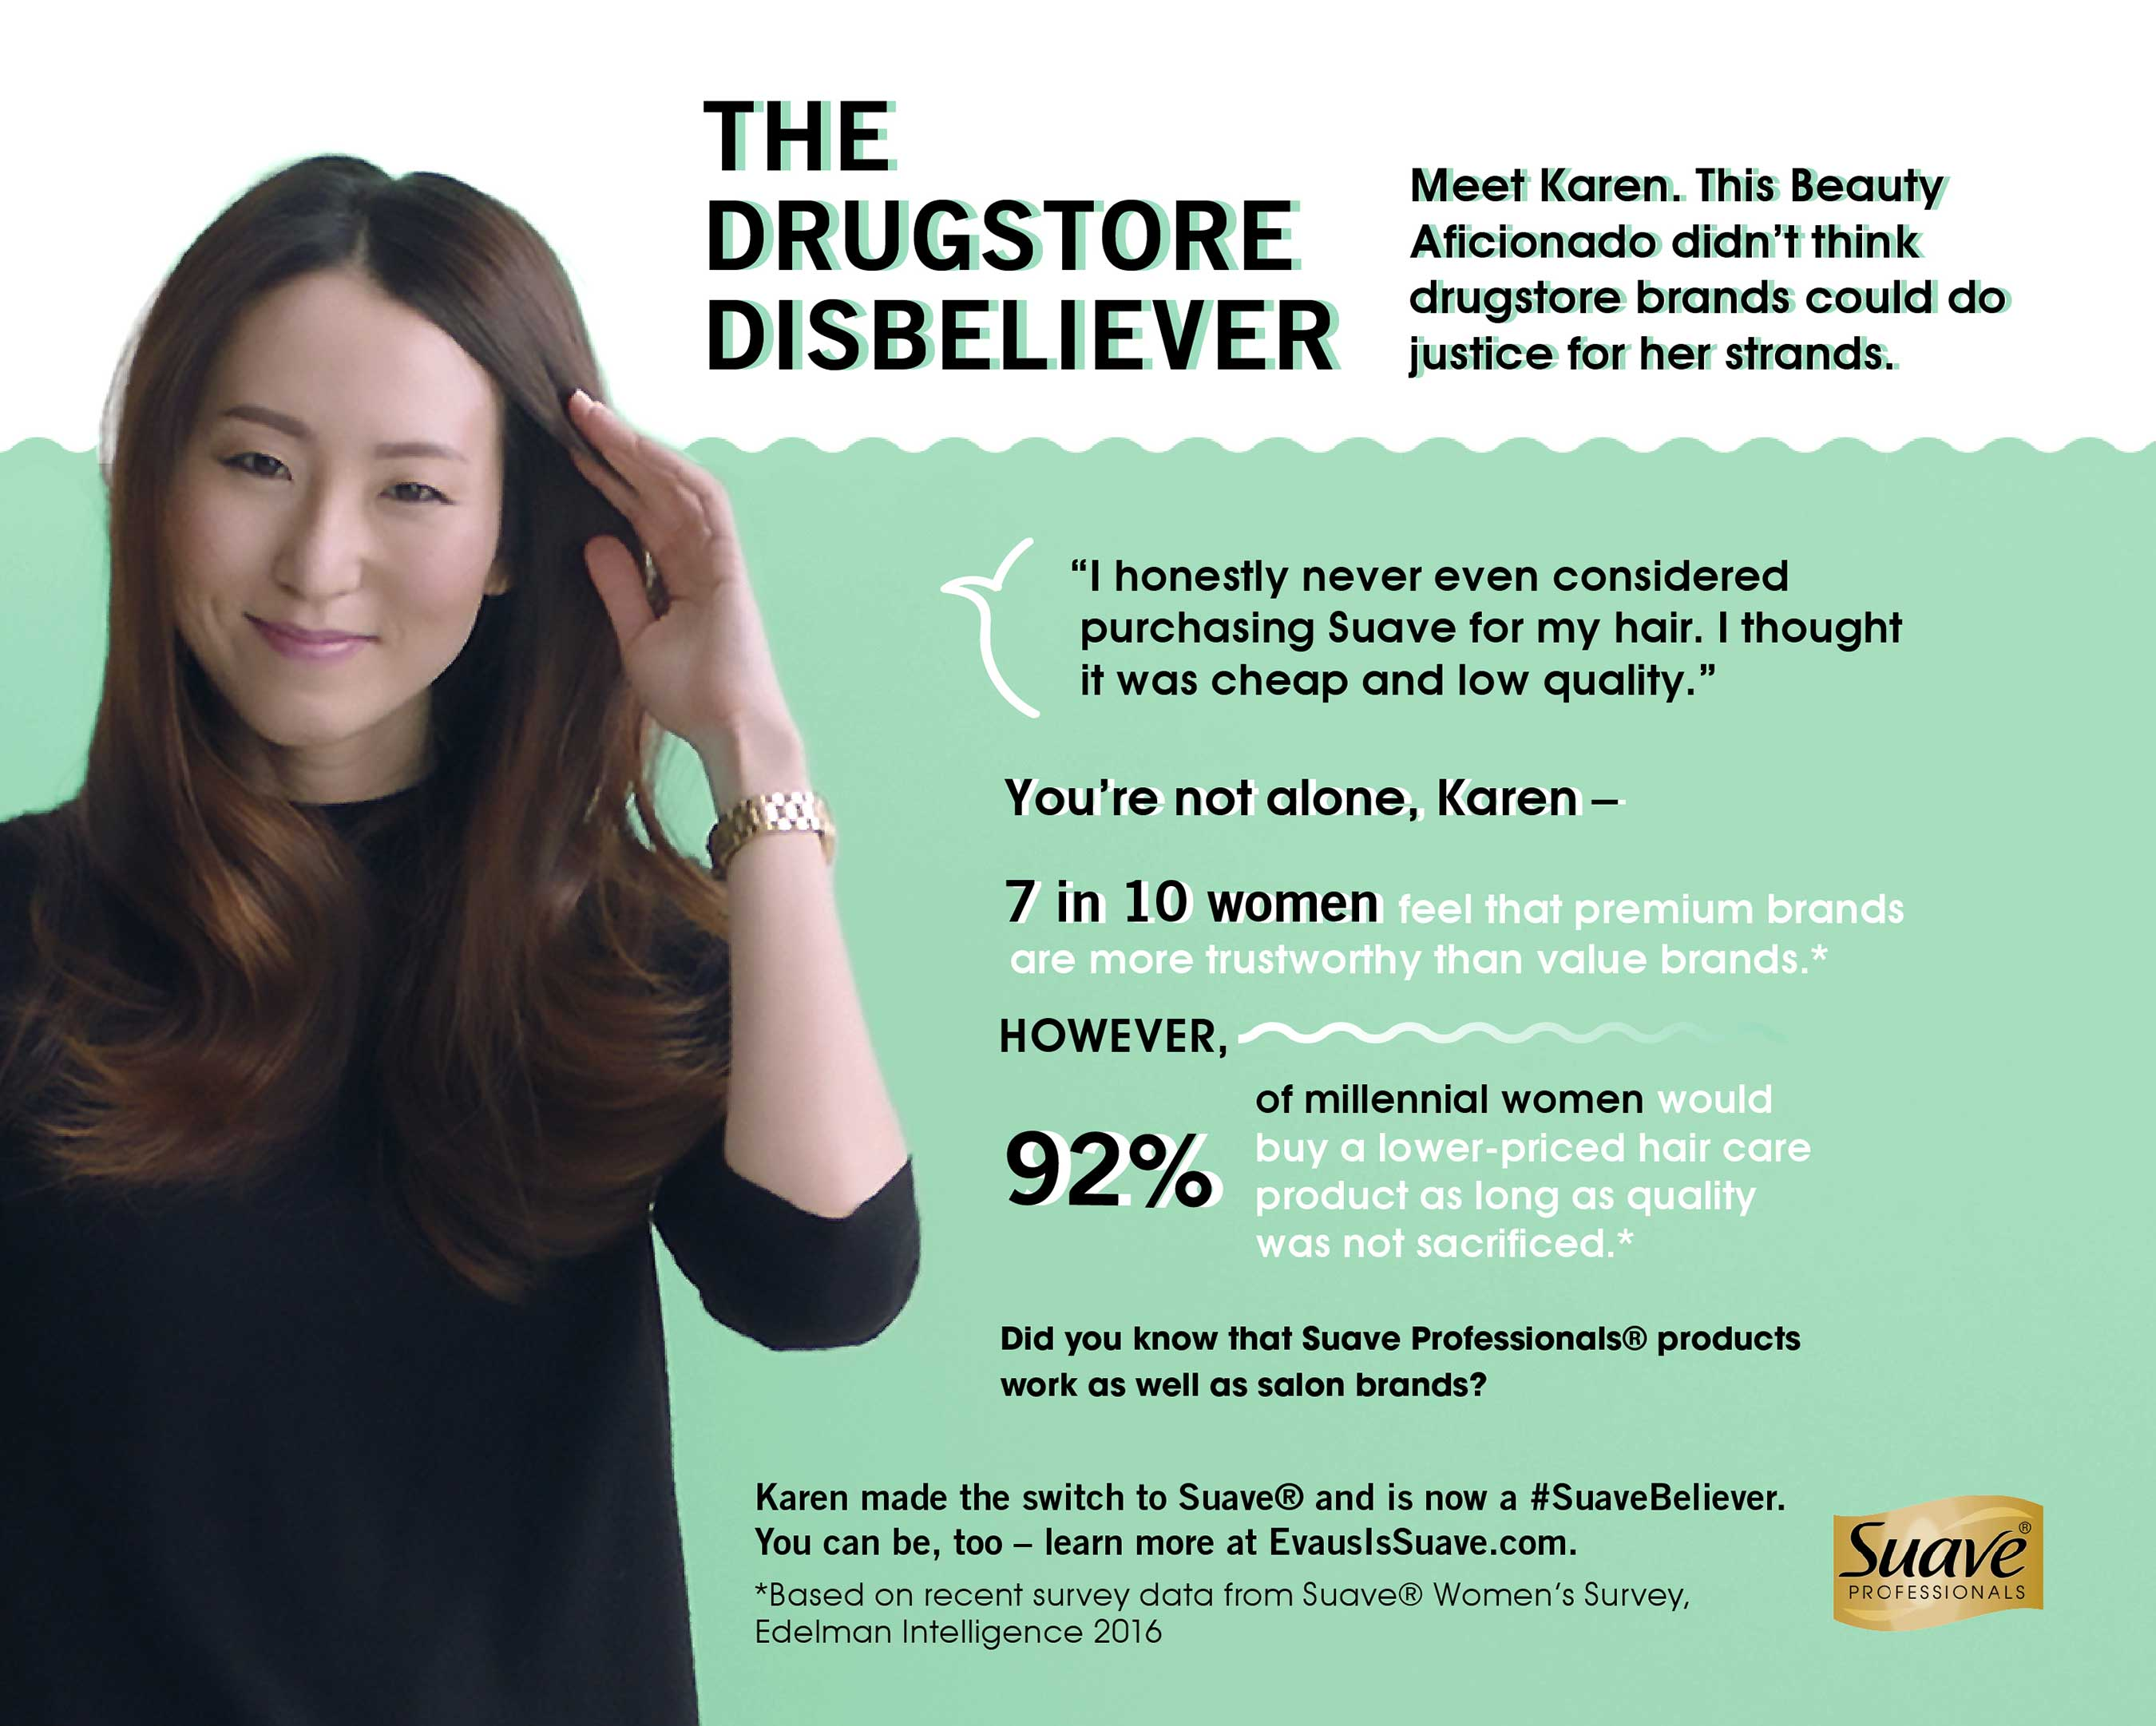 The Drugstore Disbeliever